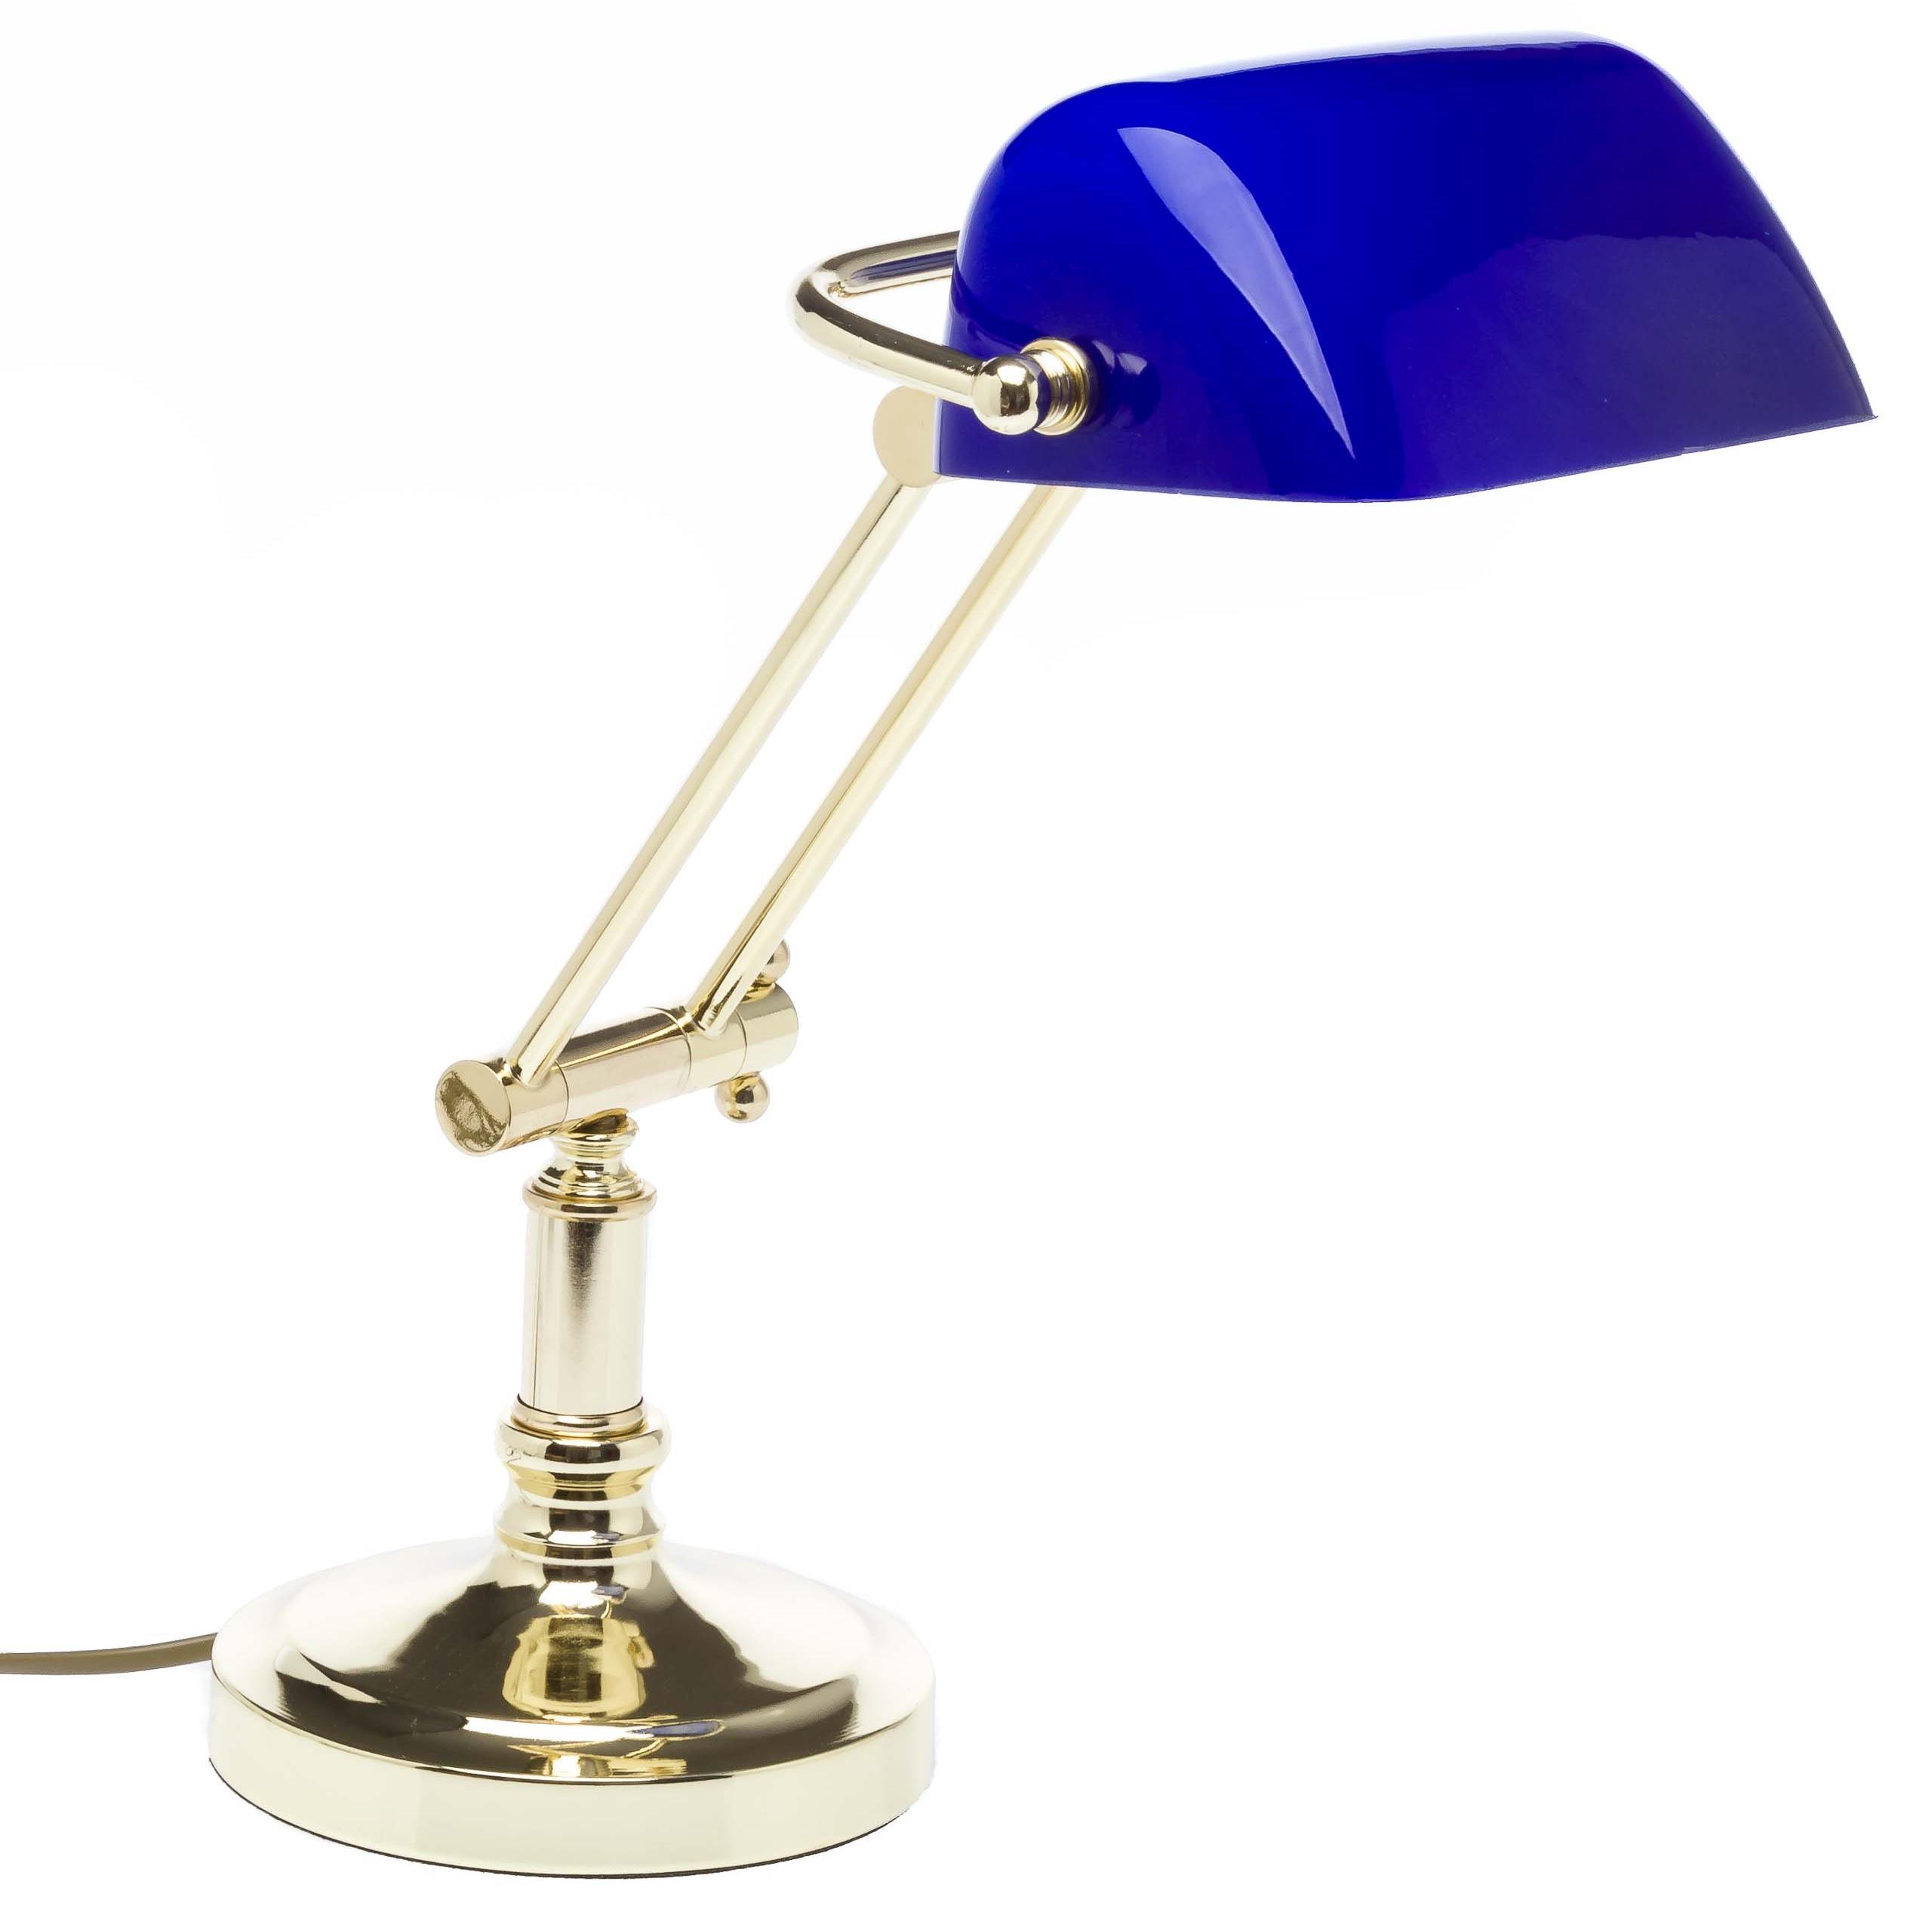 Lampada Da Tavolo Bankerslamp Lampada Da Tavolo Bankers Lampada Blu Aubaho